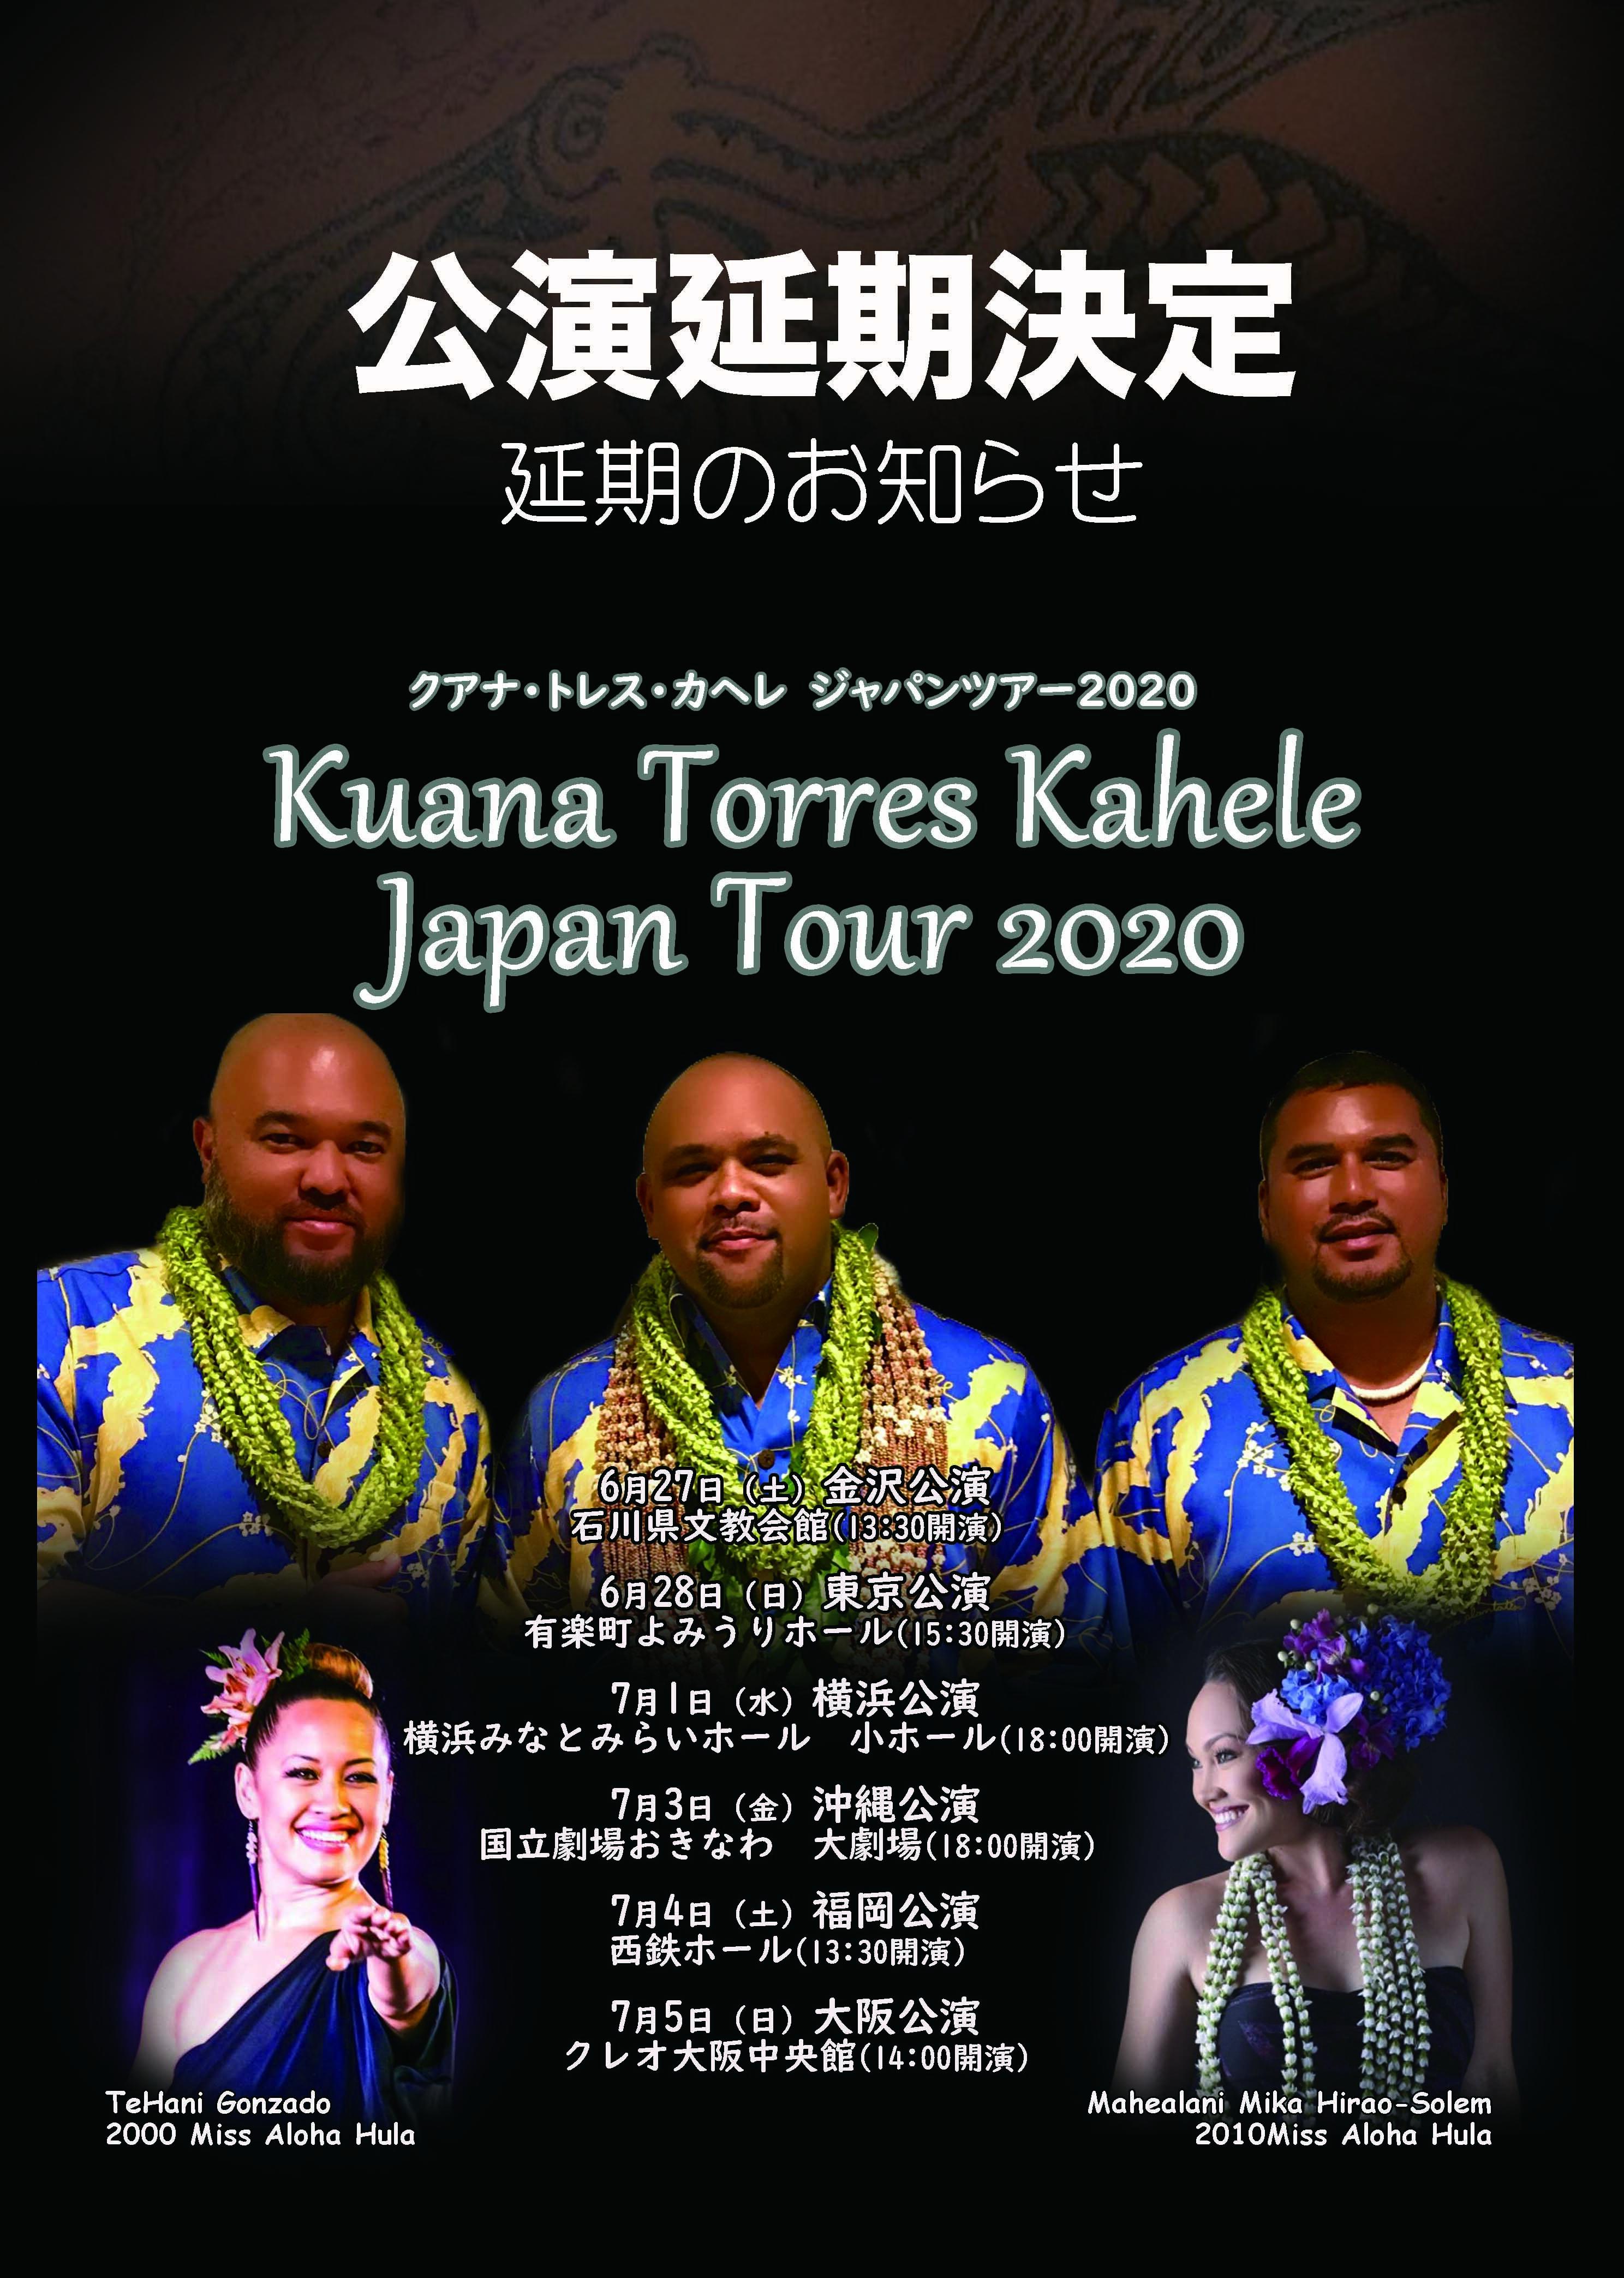 Kuana Torres Kahele Japan Tour 2021